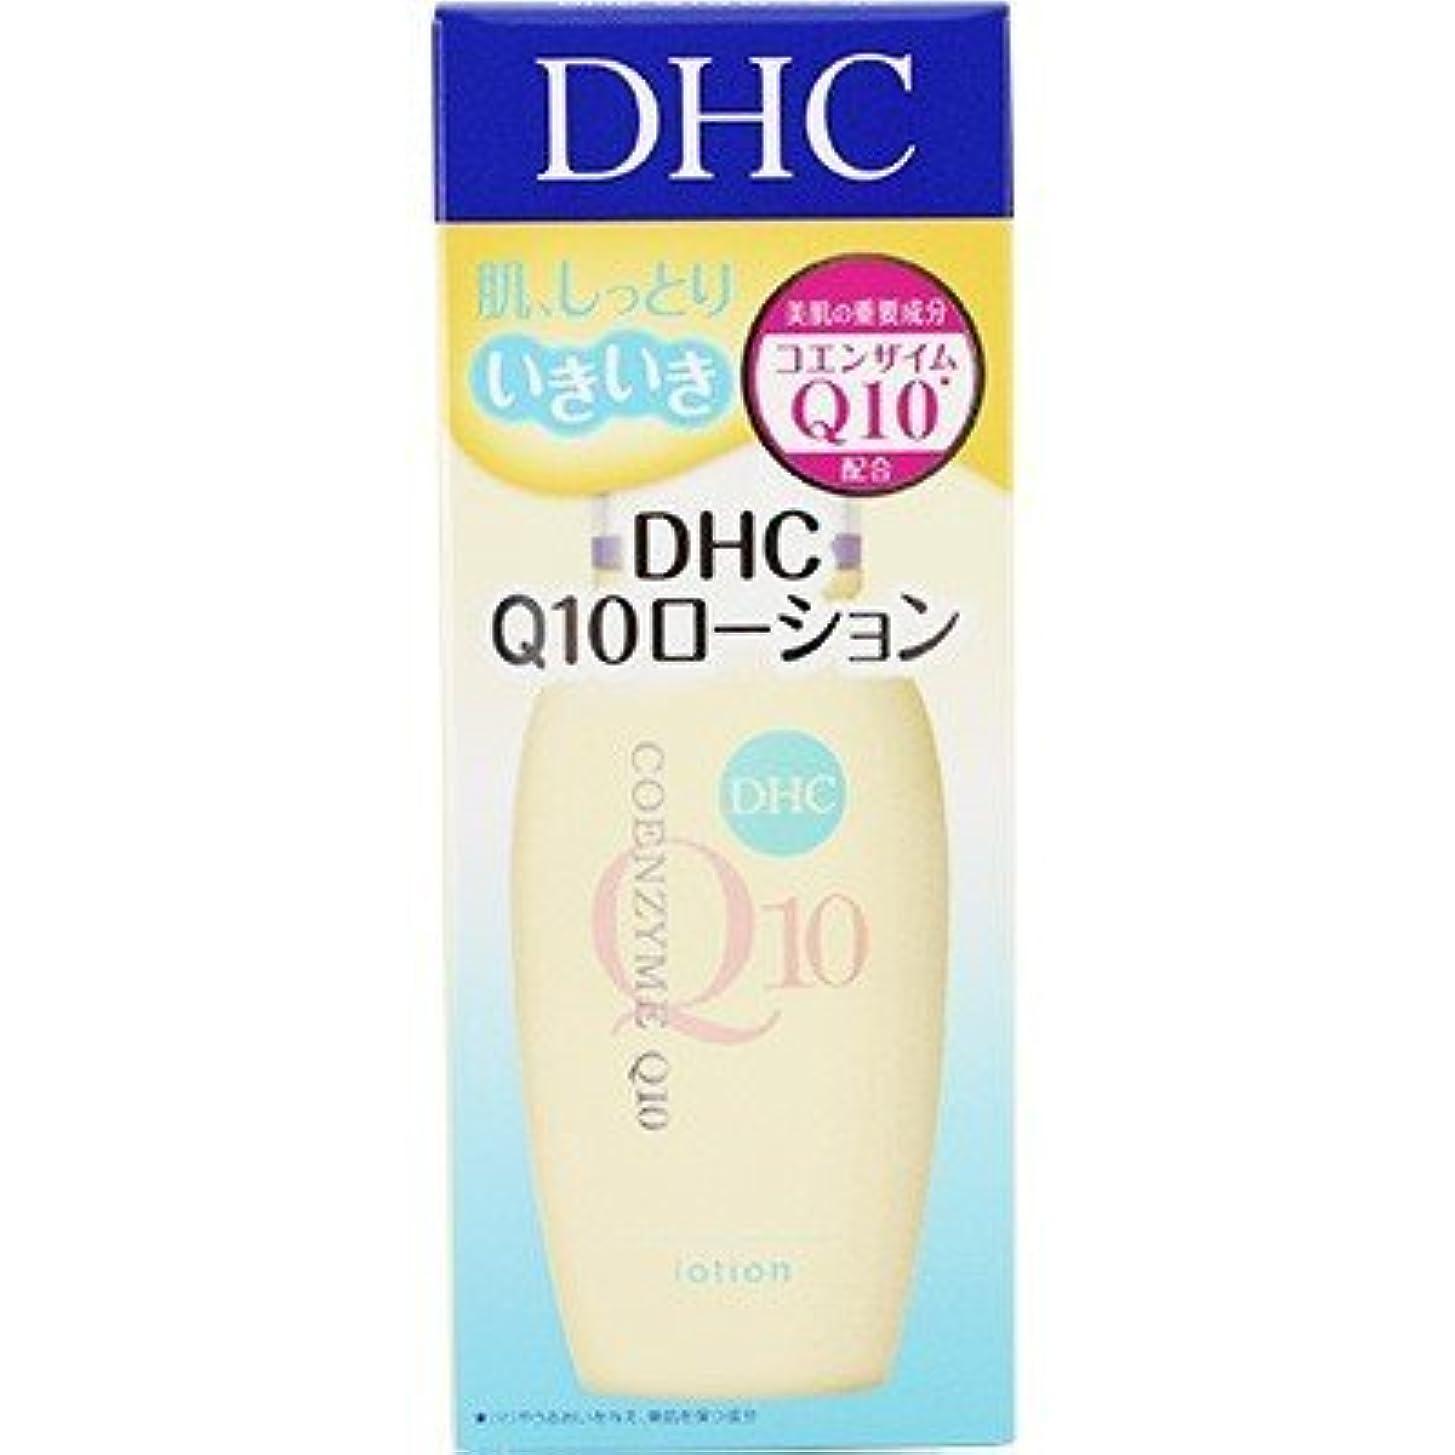 DHC?Q10ローション (SS) 60ml (化粧水) [並行輸入品]